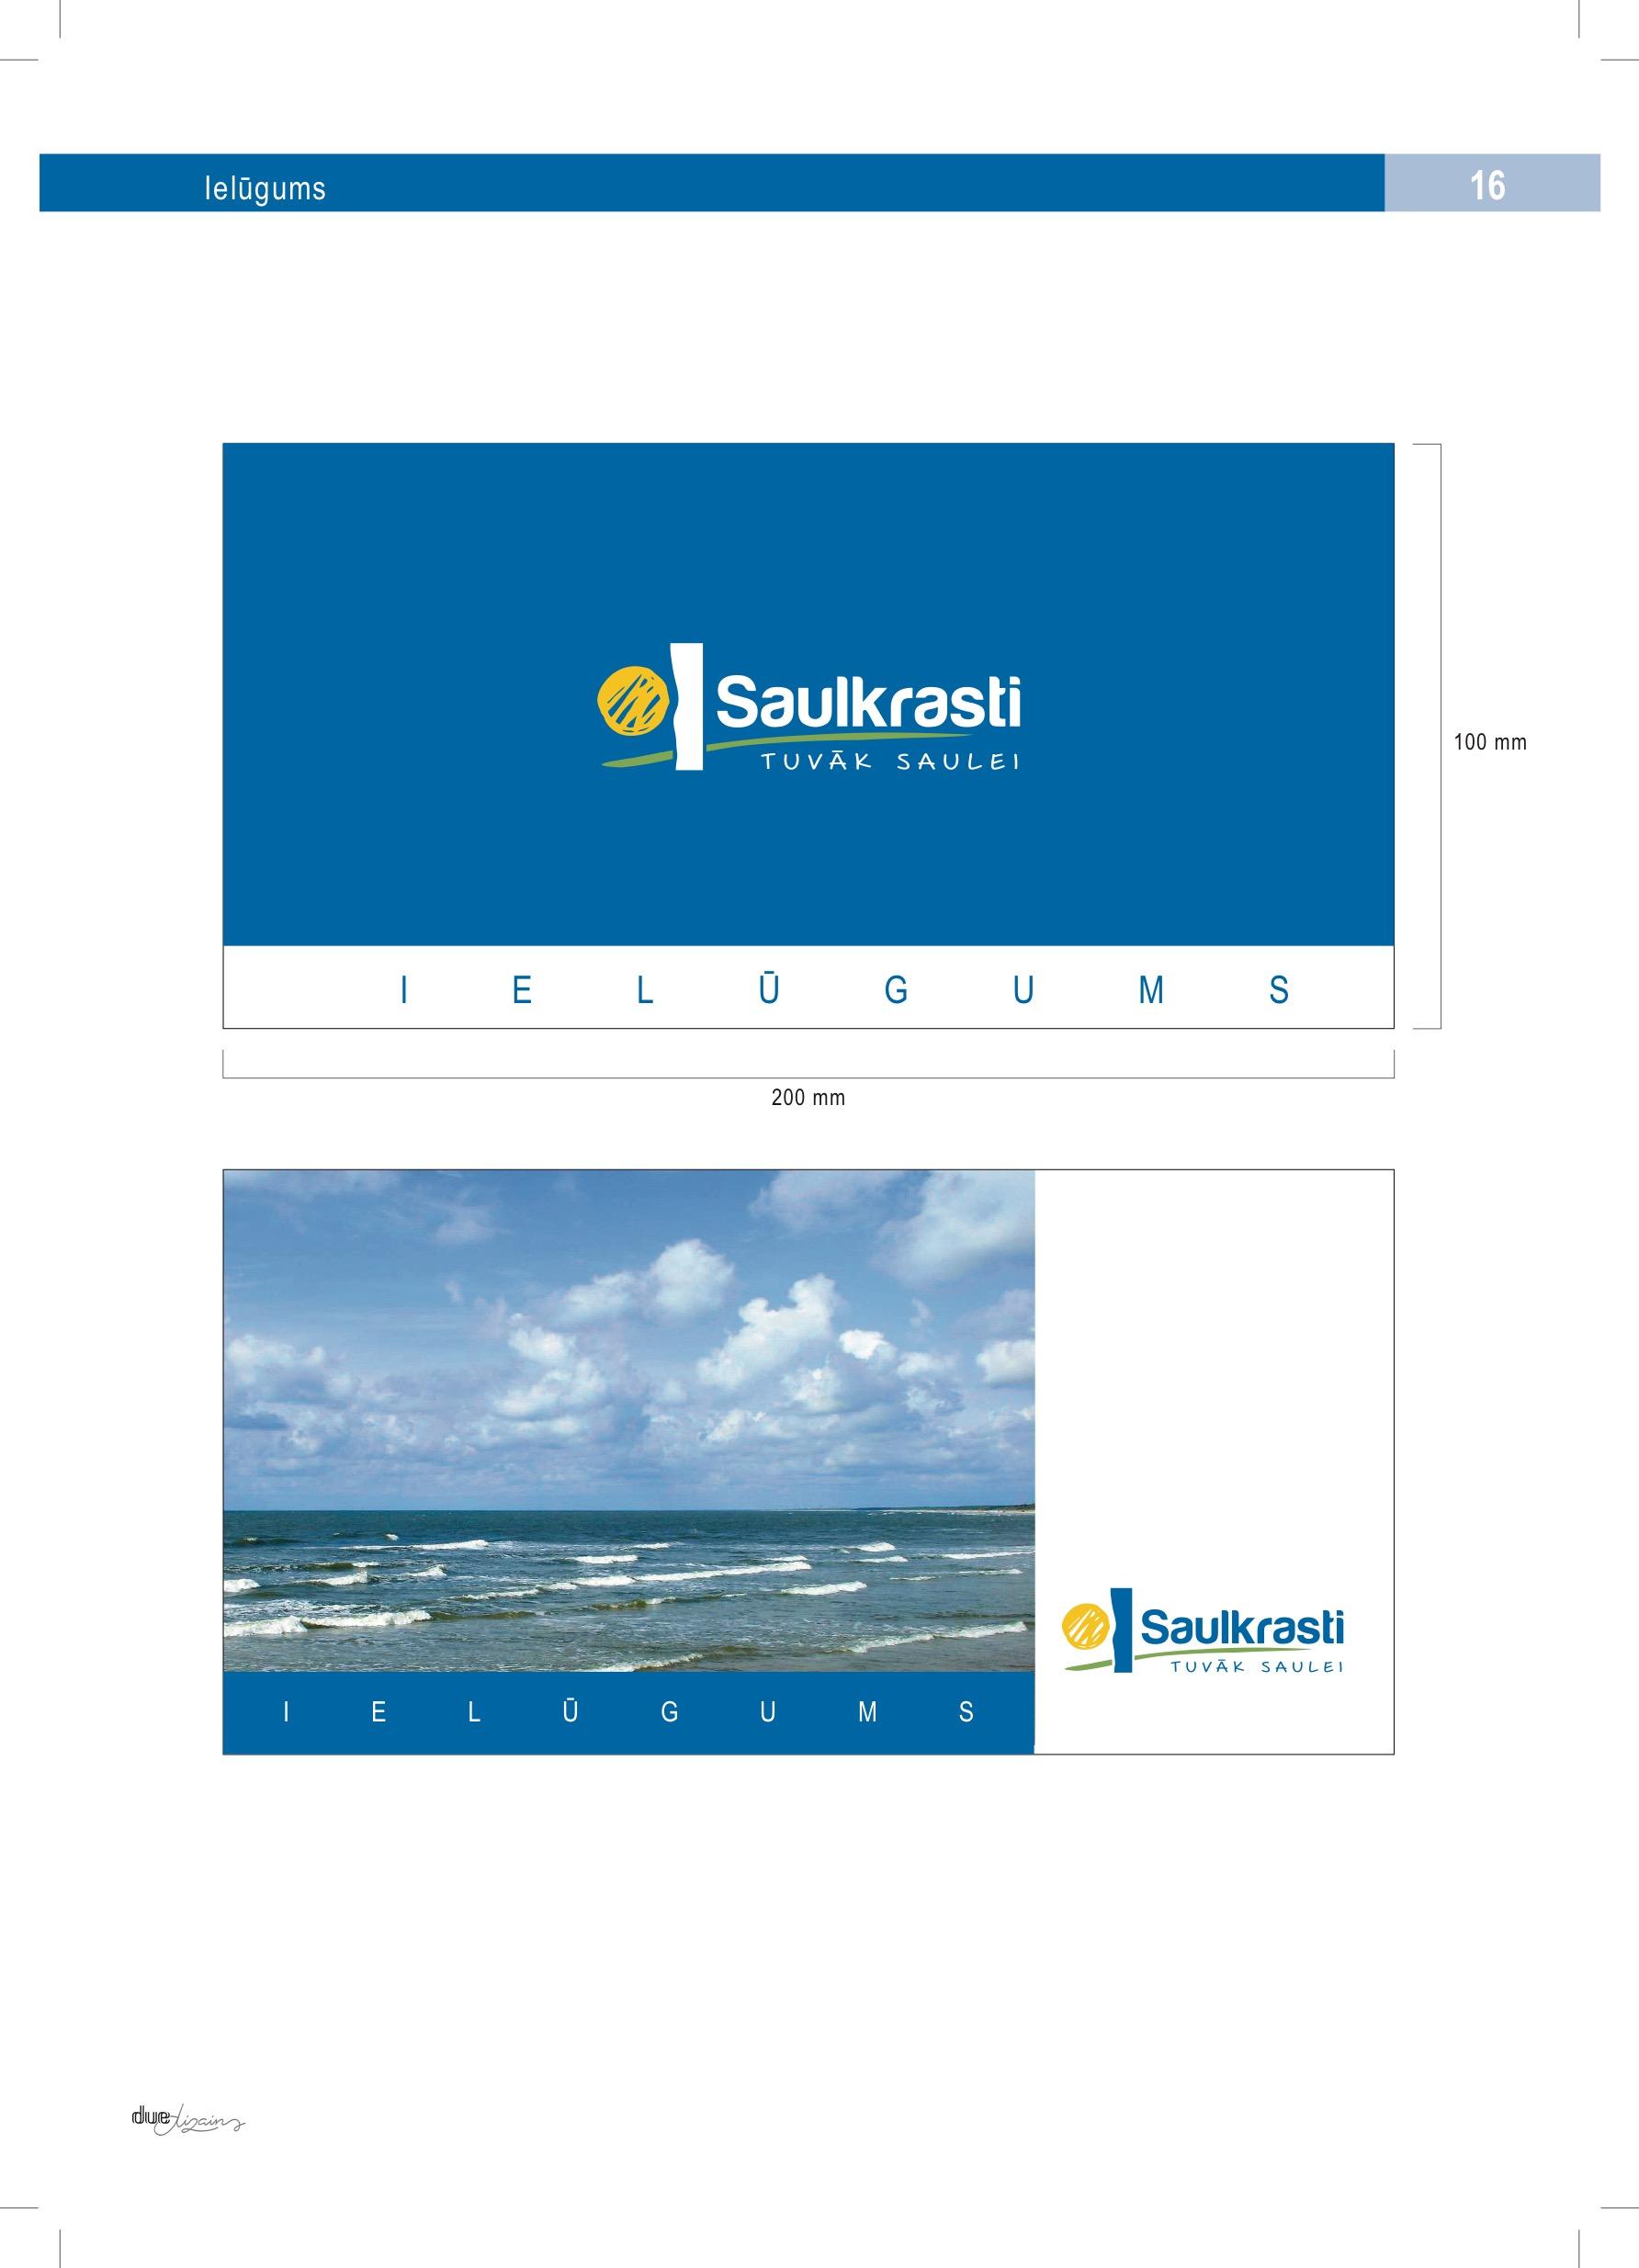 saulkrasti-print 18